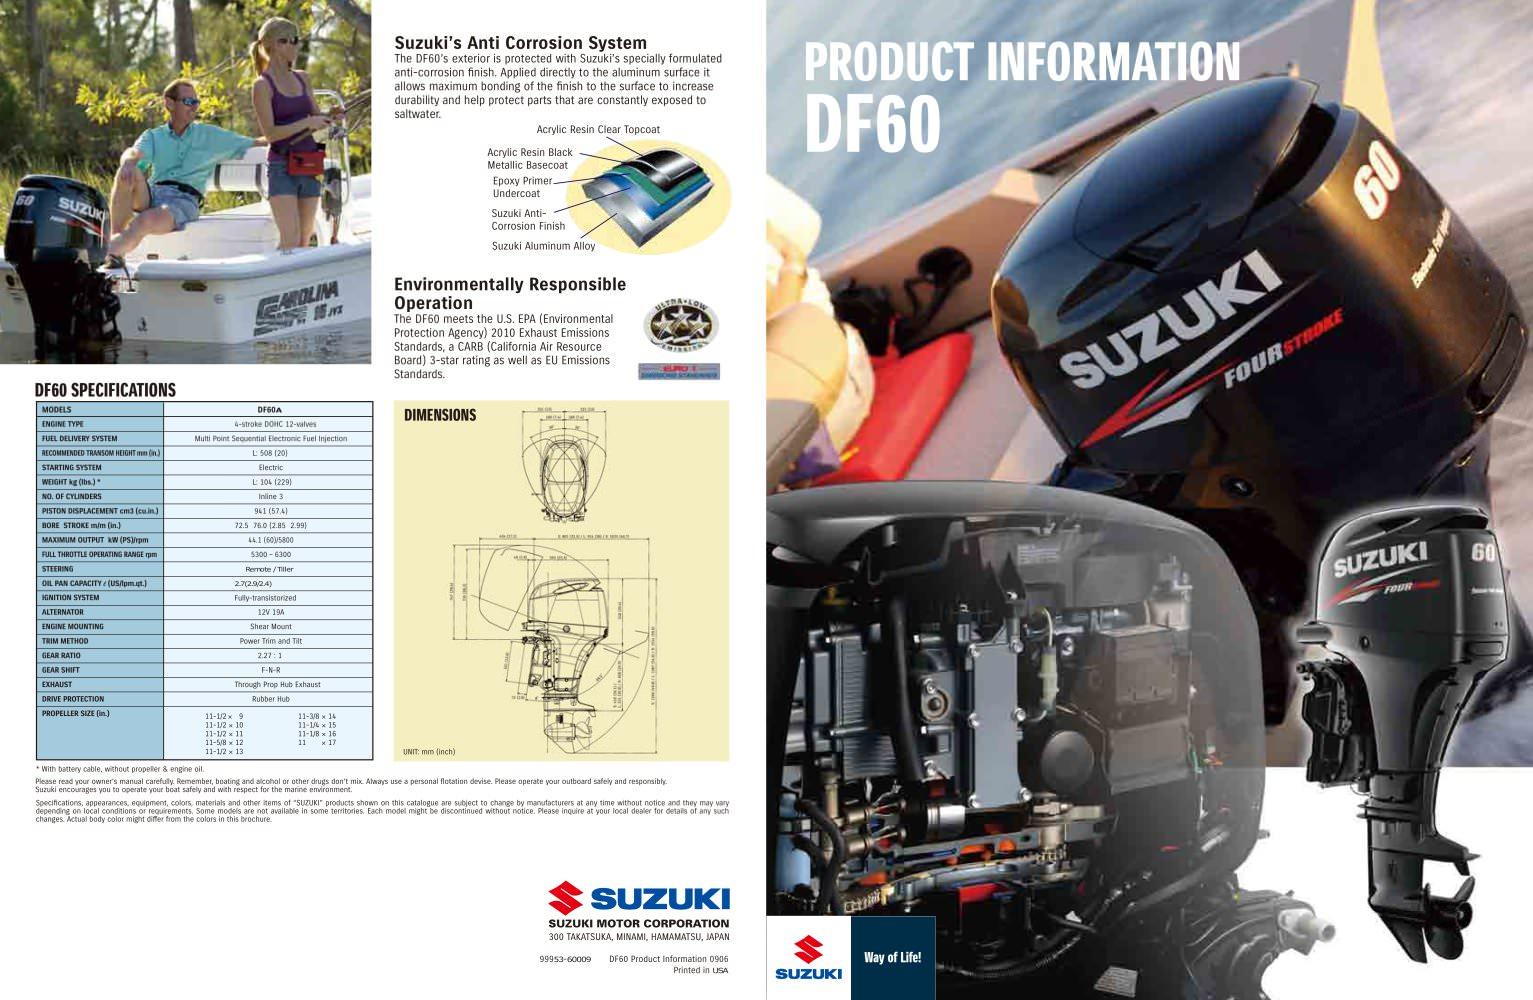 Suzuki Df115 Manual Ebook Home Promac Petrol Pure Sine Wave Generator Electric Start81kva Array Df60 Marine Pdf Catalogues Documentation Boating Rh Nauticexpo Com